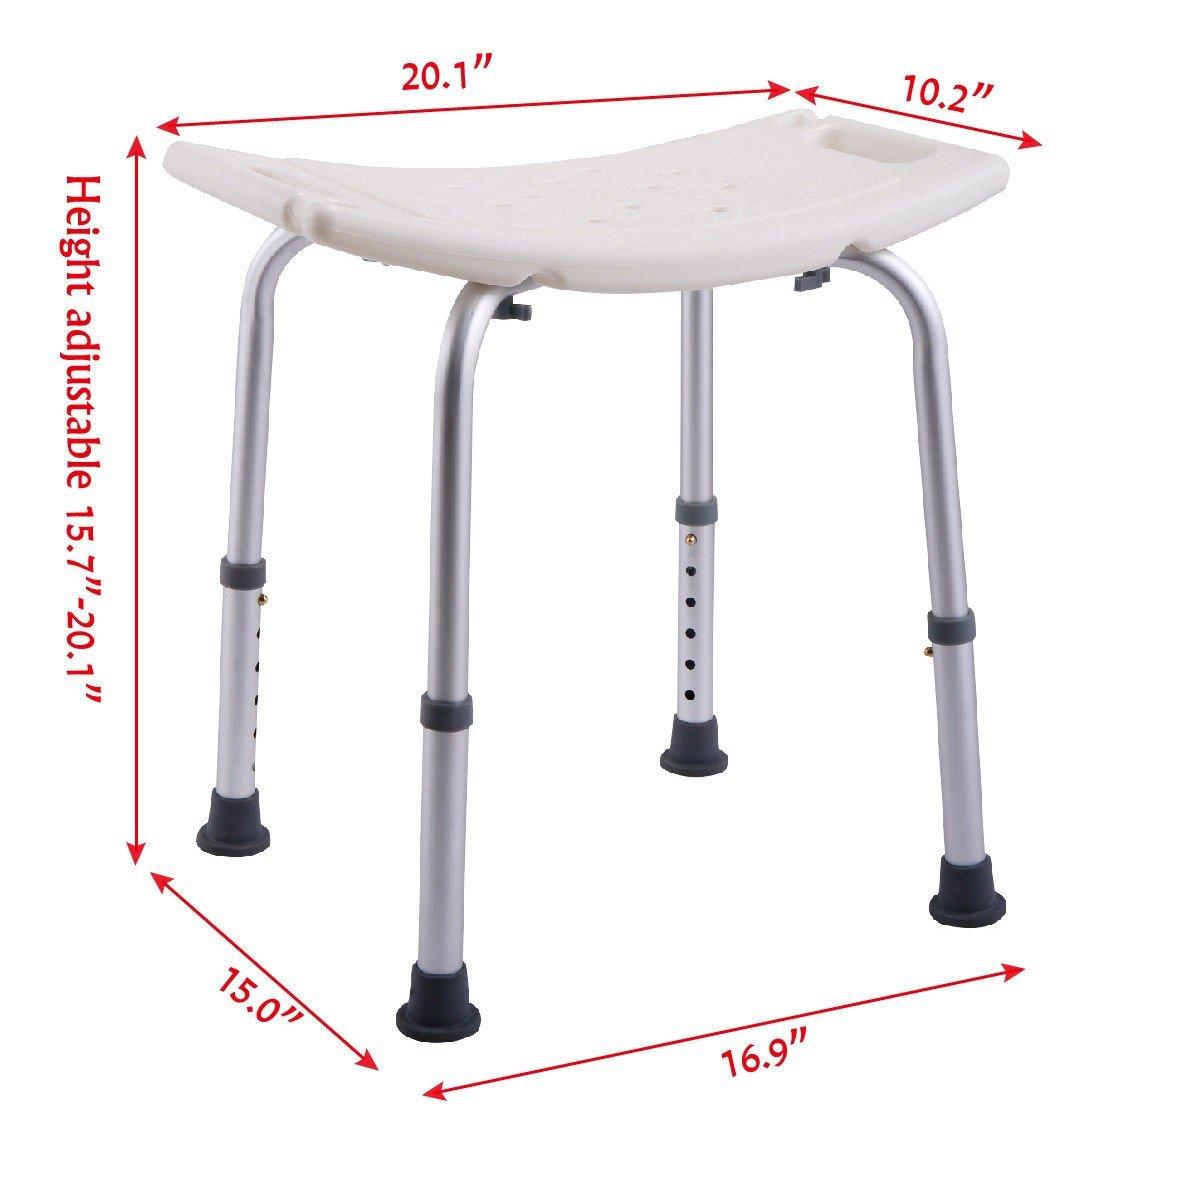 6 Height Adjustable Bath Shower Chair Medical Seat Stool Bath Tub ...